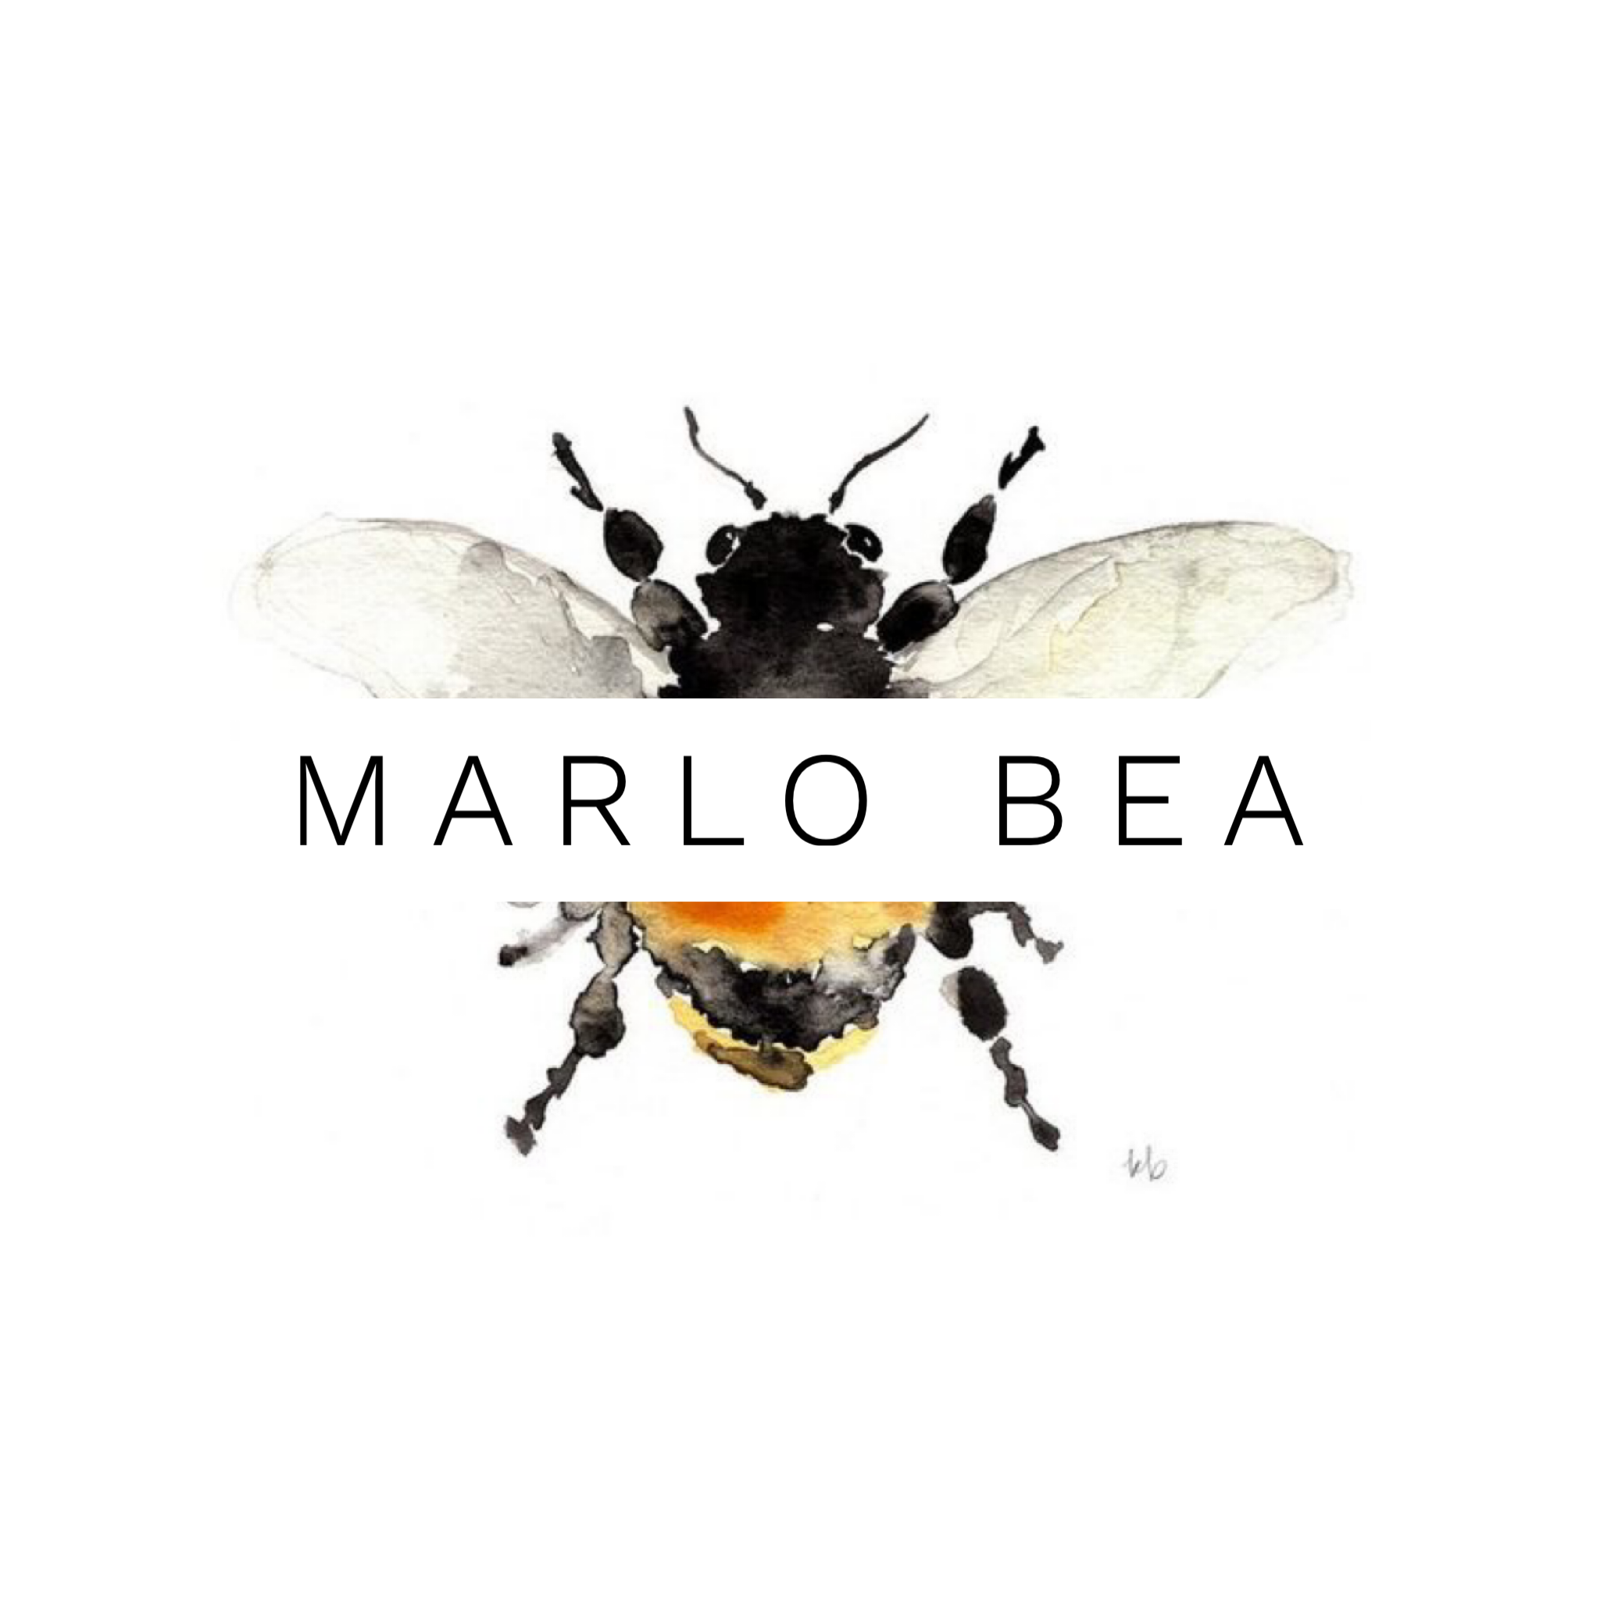 marlo bea's account image